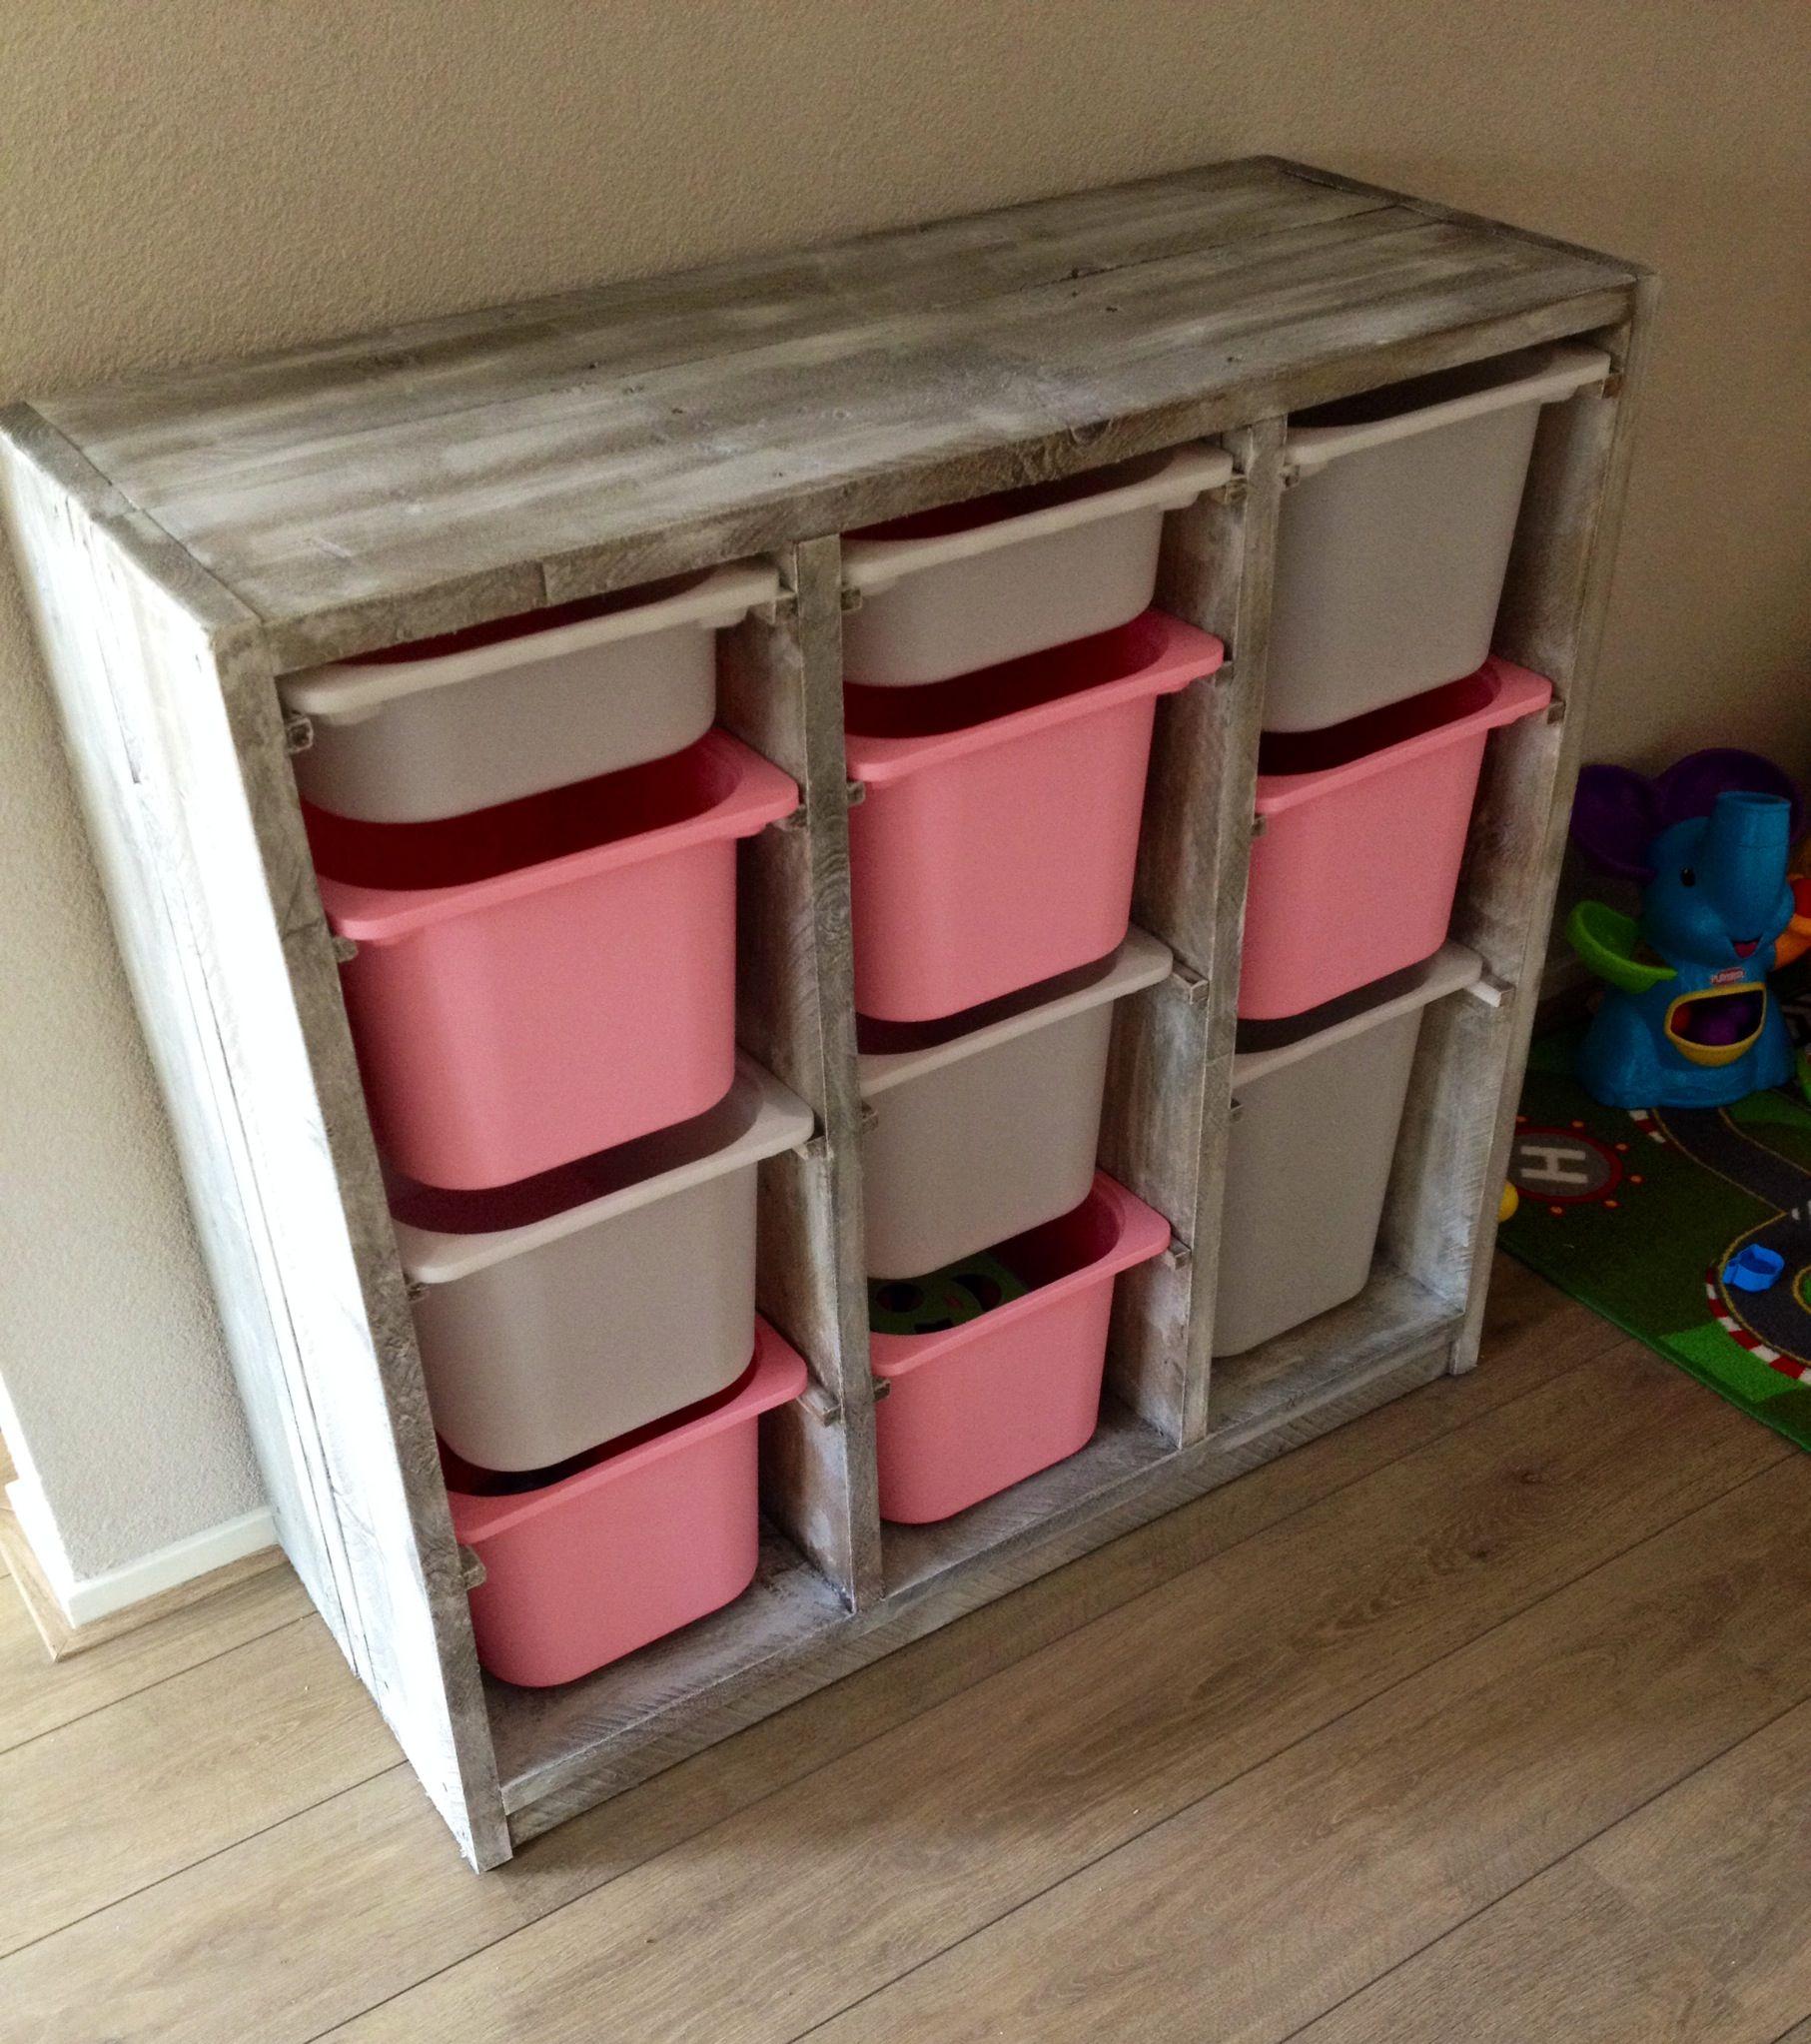 Ikea Opbergkast Kinderkamer.Steigerhouten Speelgoed Kast In 2019 Opberg Kinderkamer